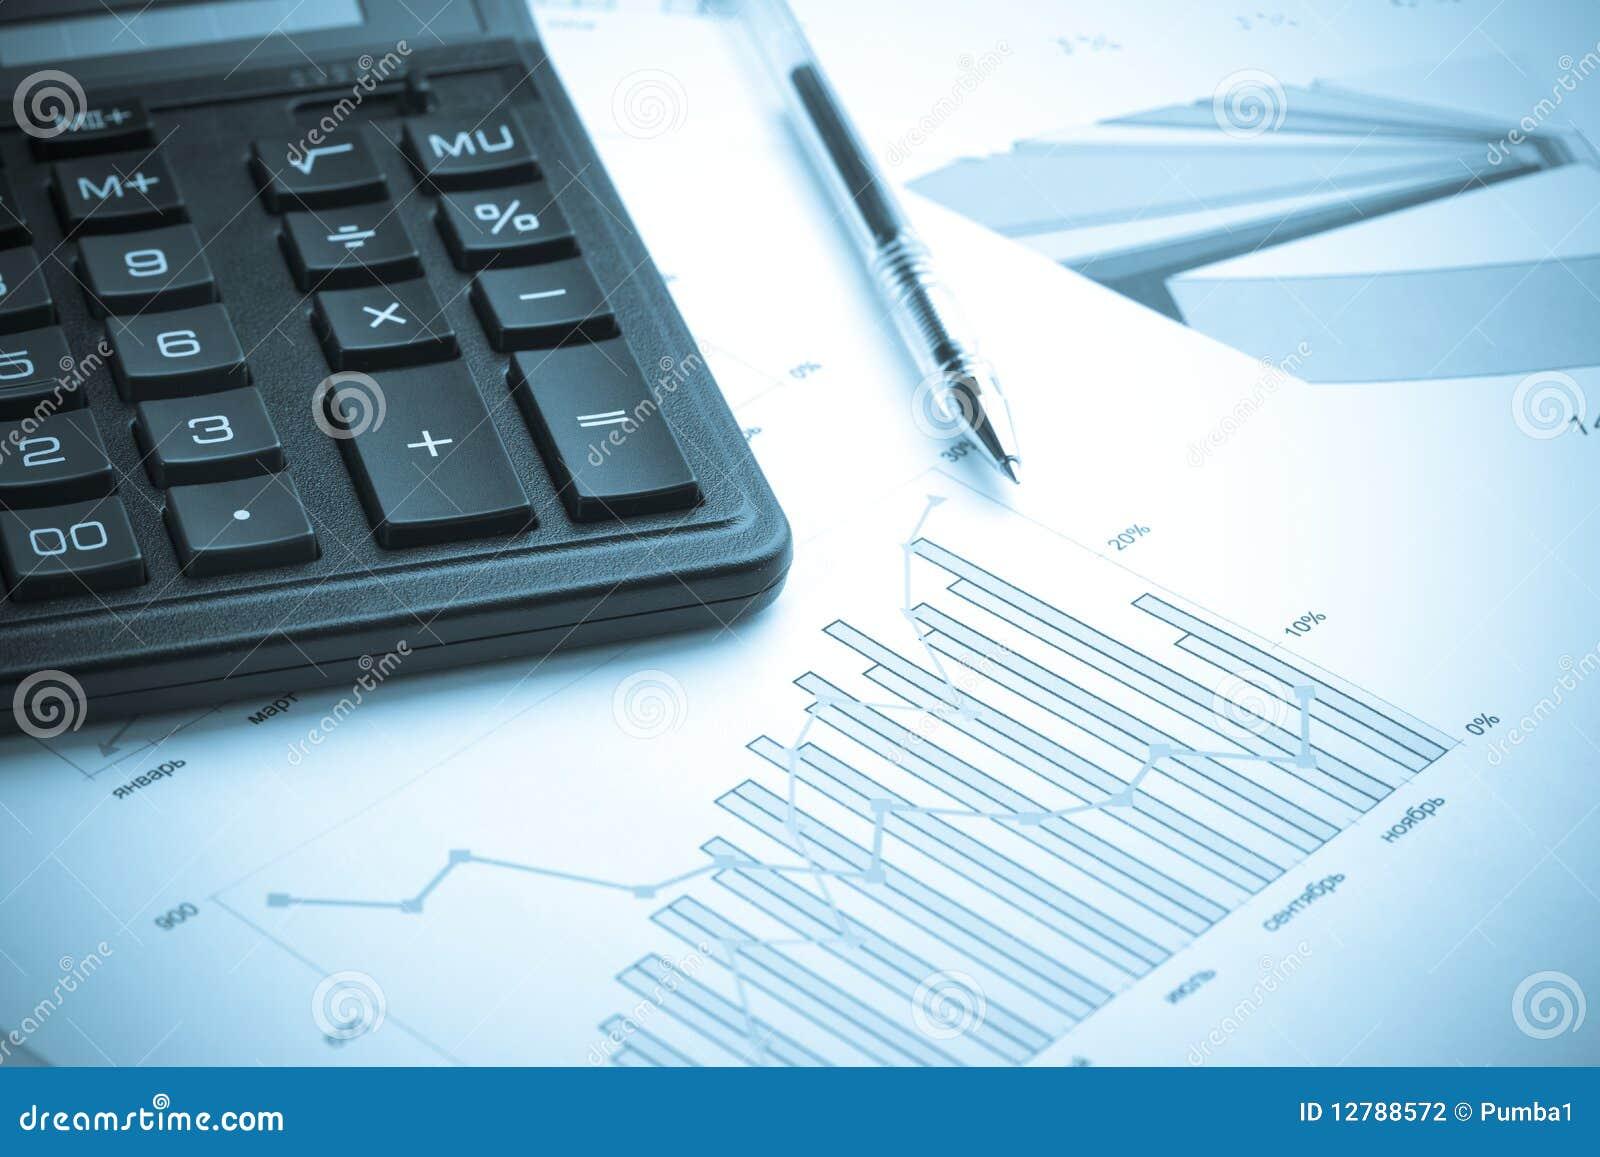 Calculating finances.Cold tone.